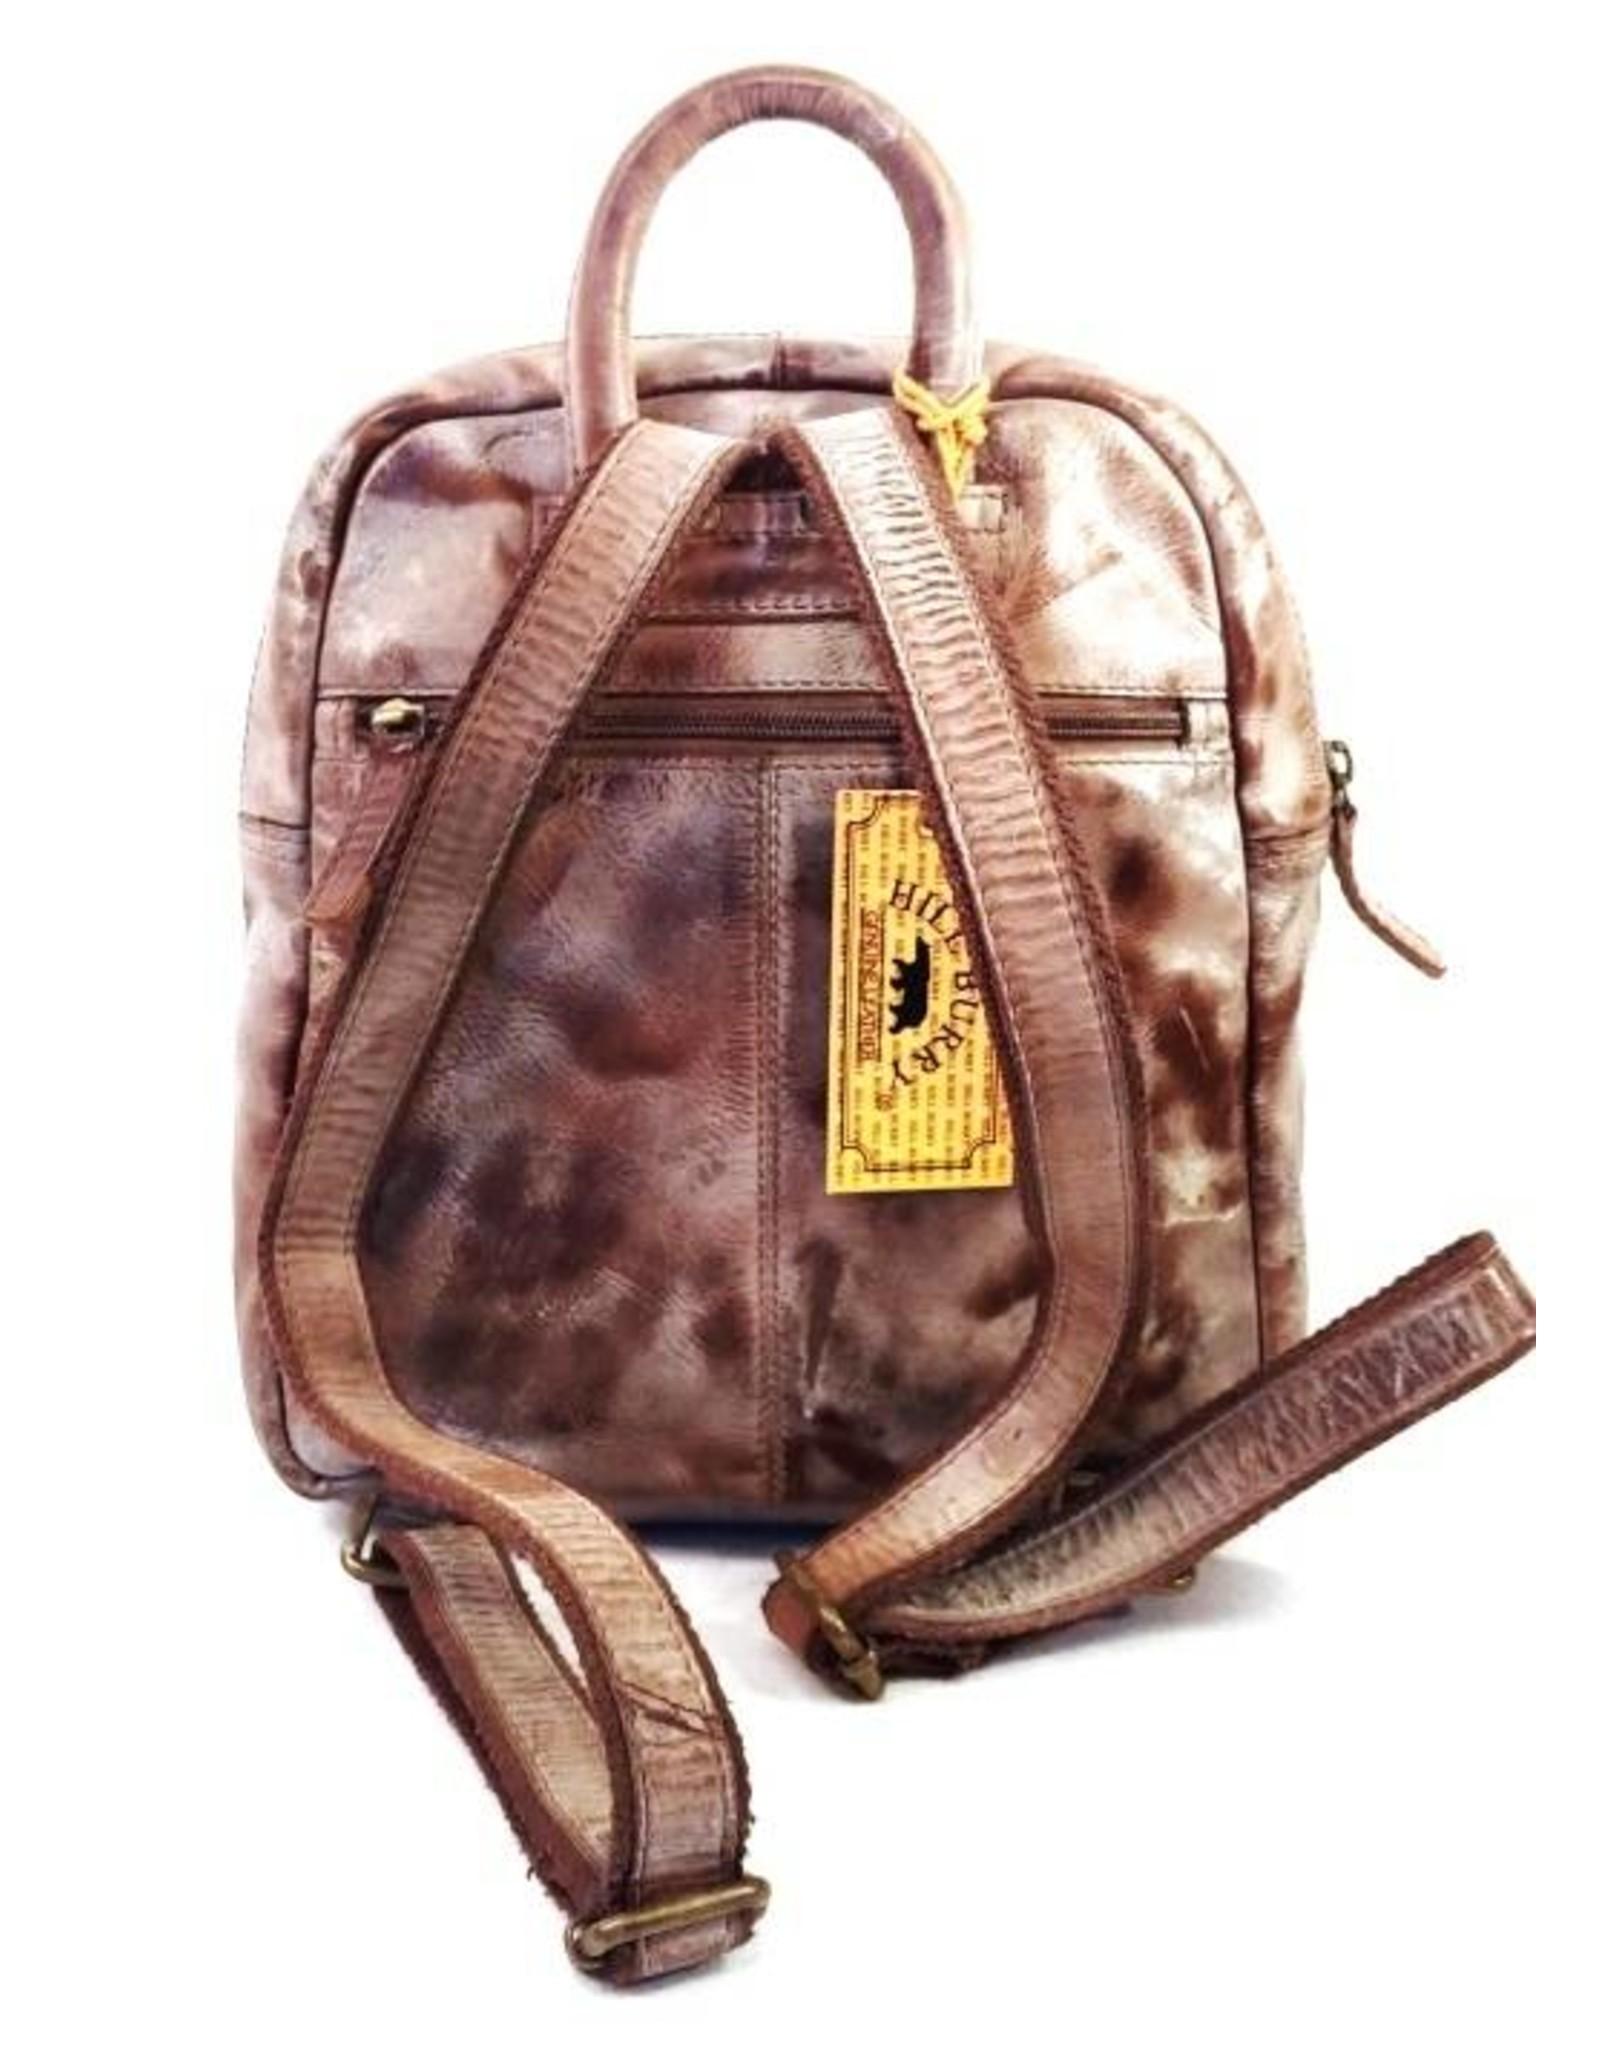 HillBurry Leather backpacks - HillBurry leather backpack 2436